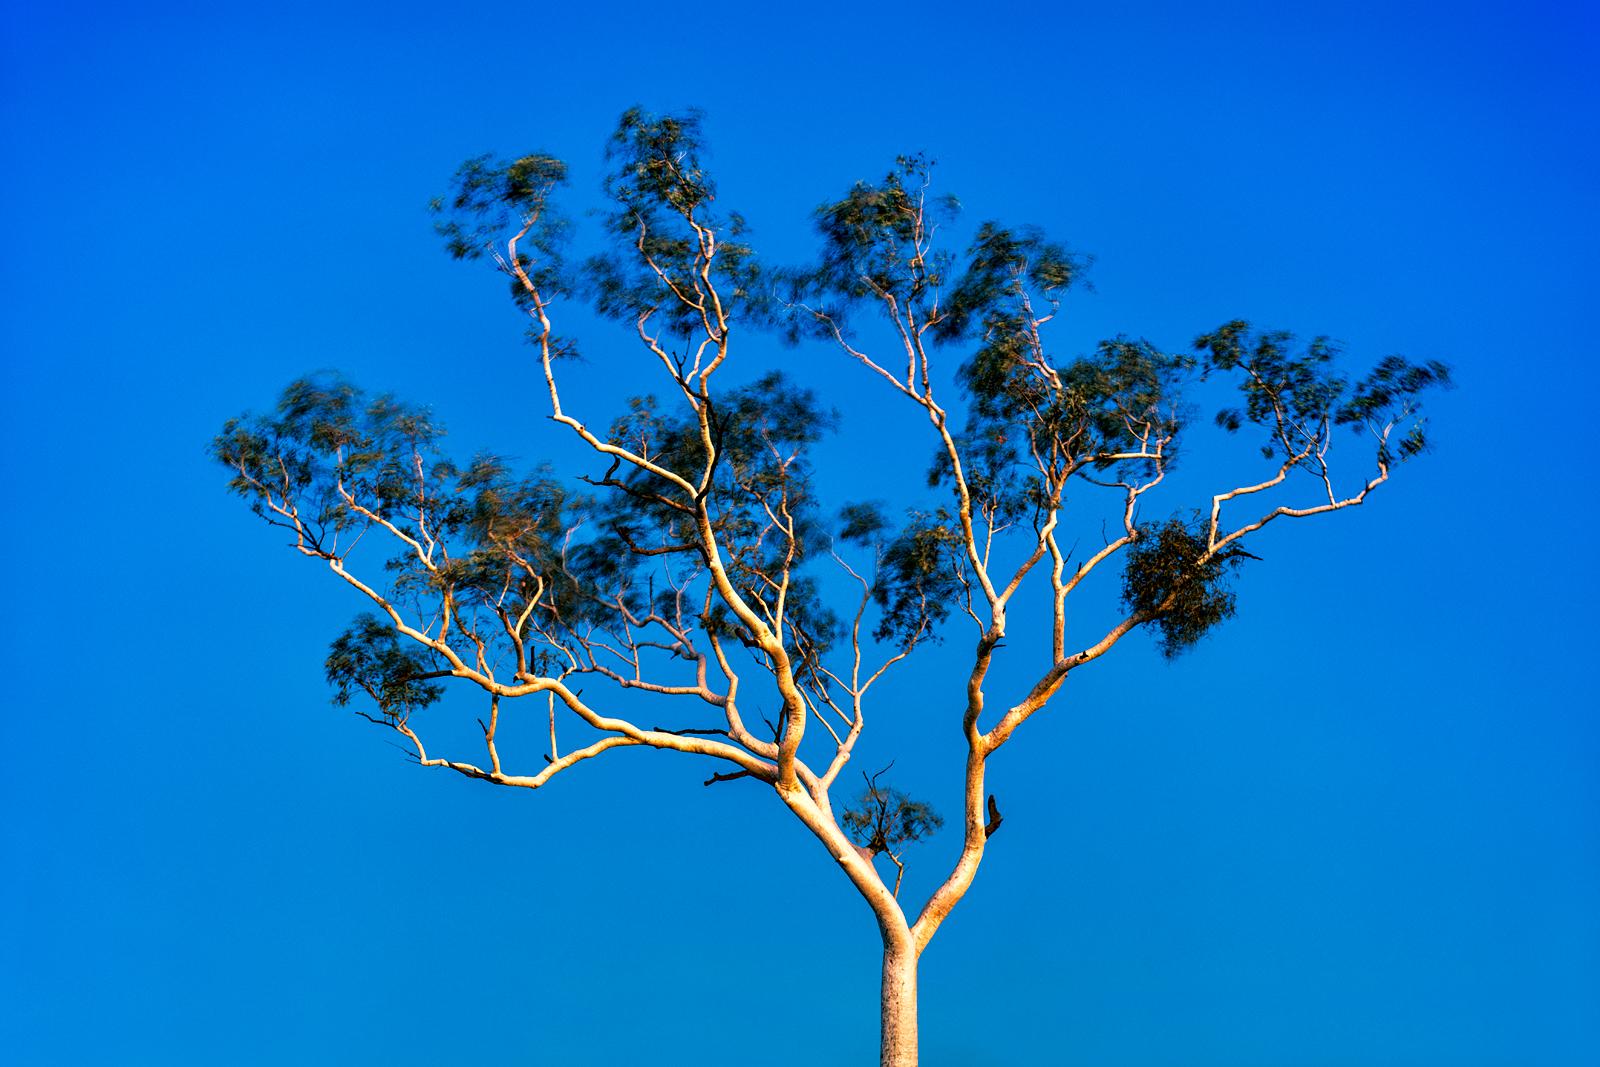 Gum Tree at Dusk, Karijini NP